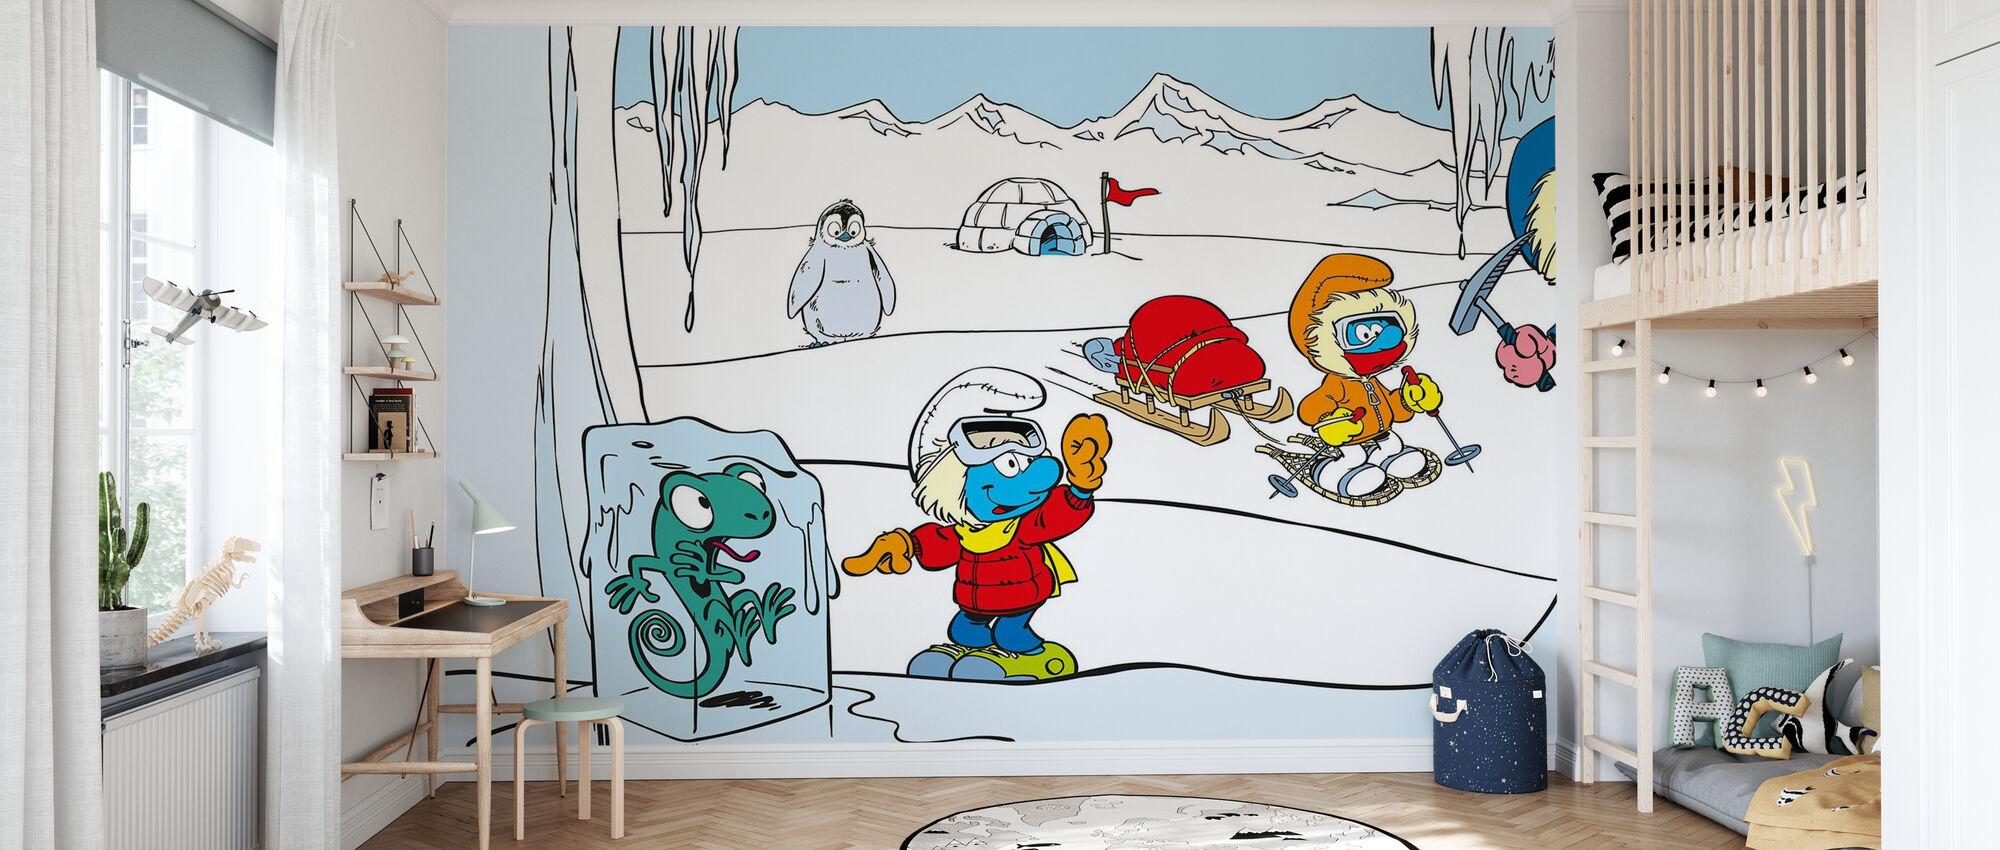 Smurfs - Iglo - Wallpaper - Kids Room